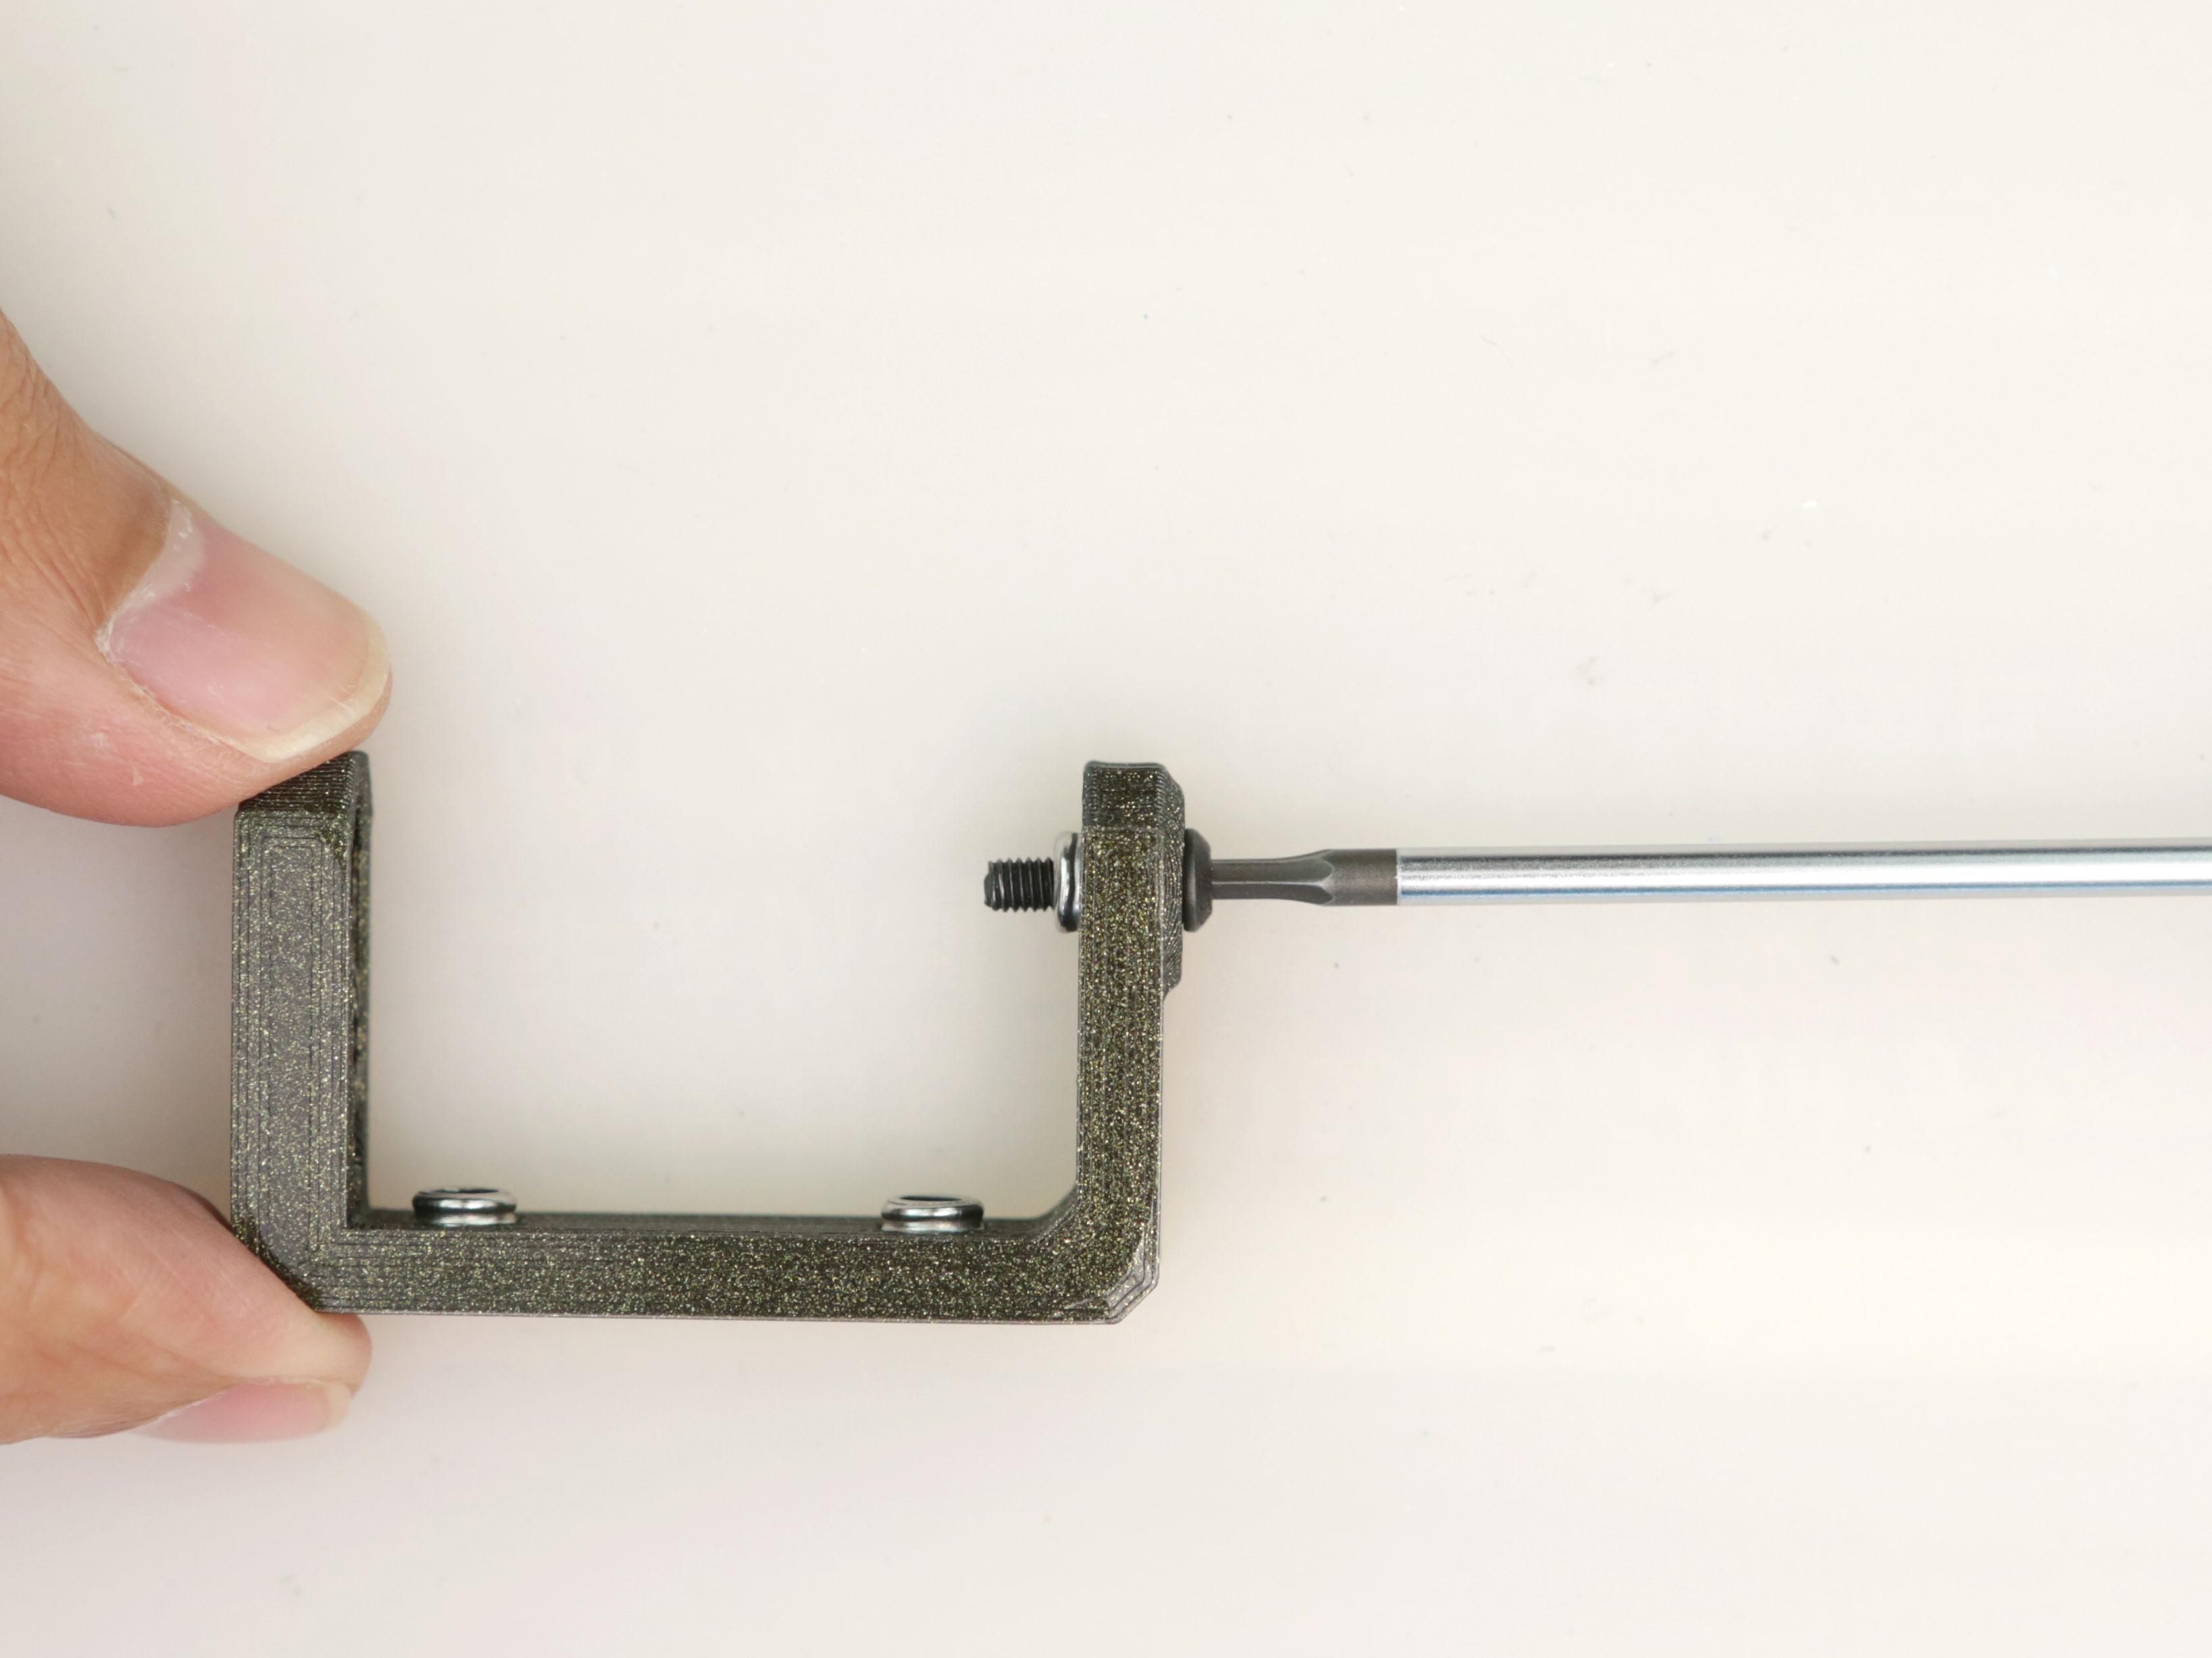 3d_printing_servo-arm-bearing-nut-installing.jpg